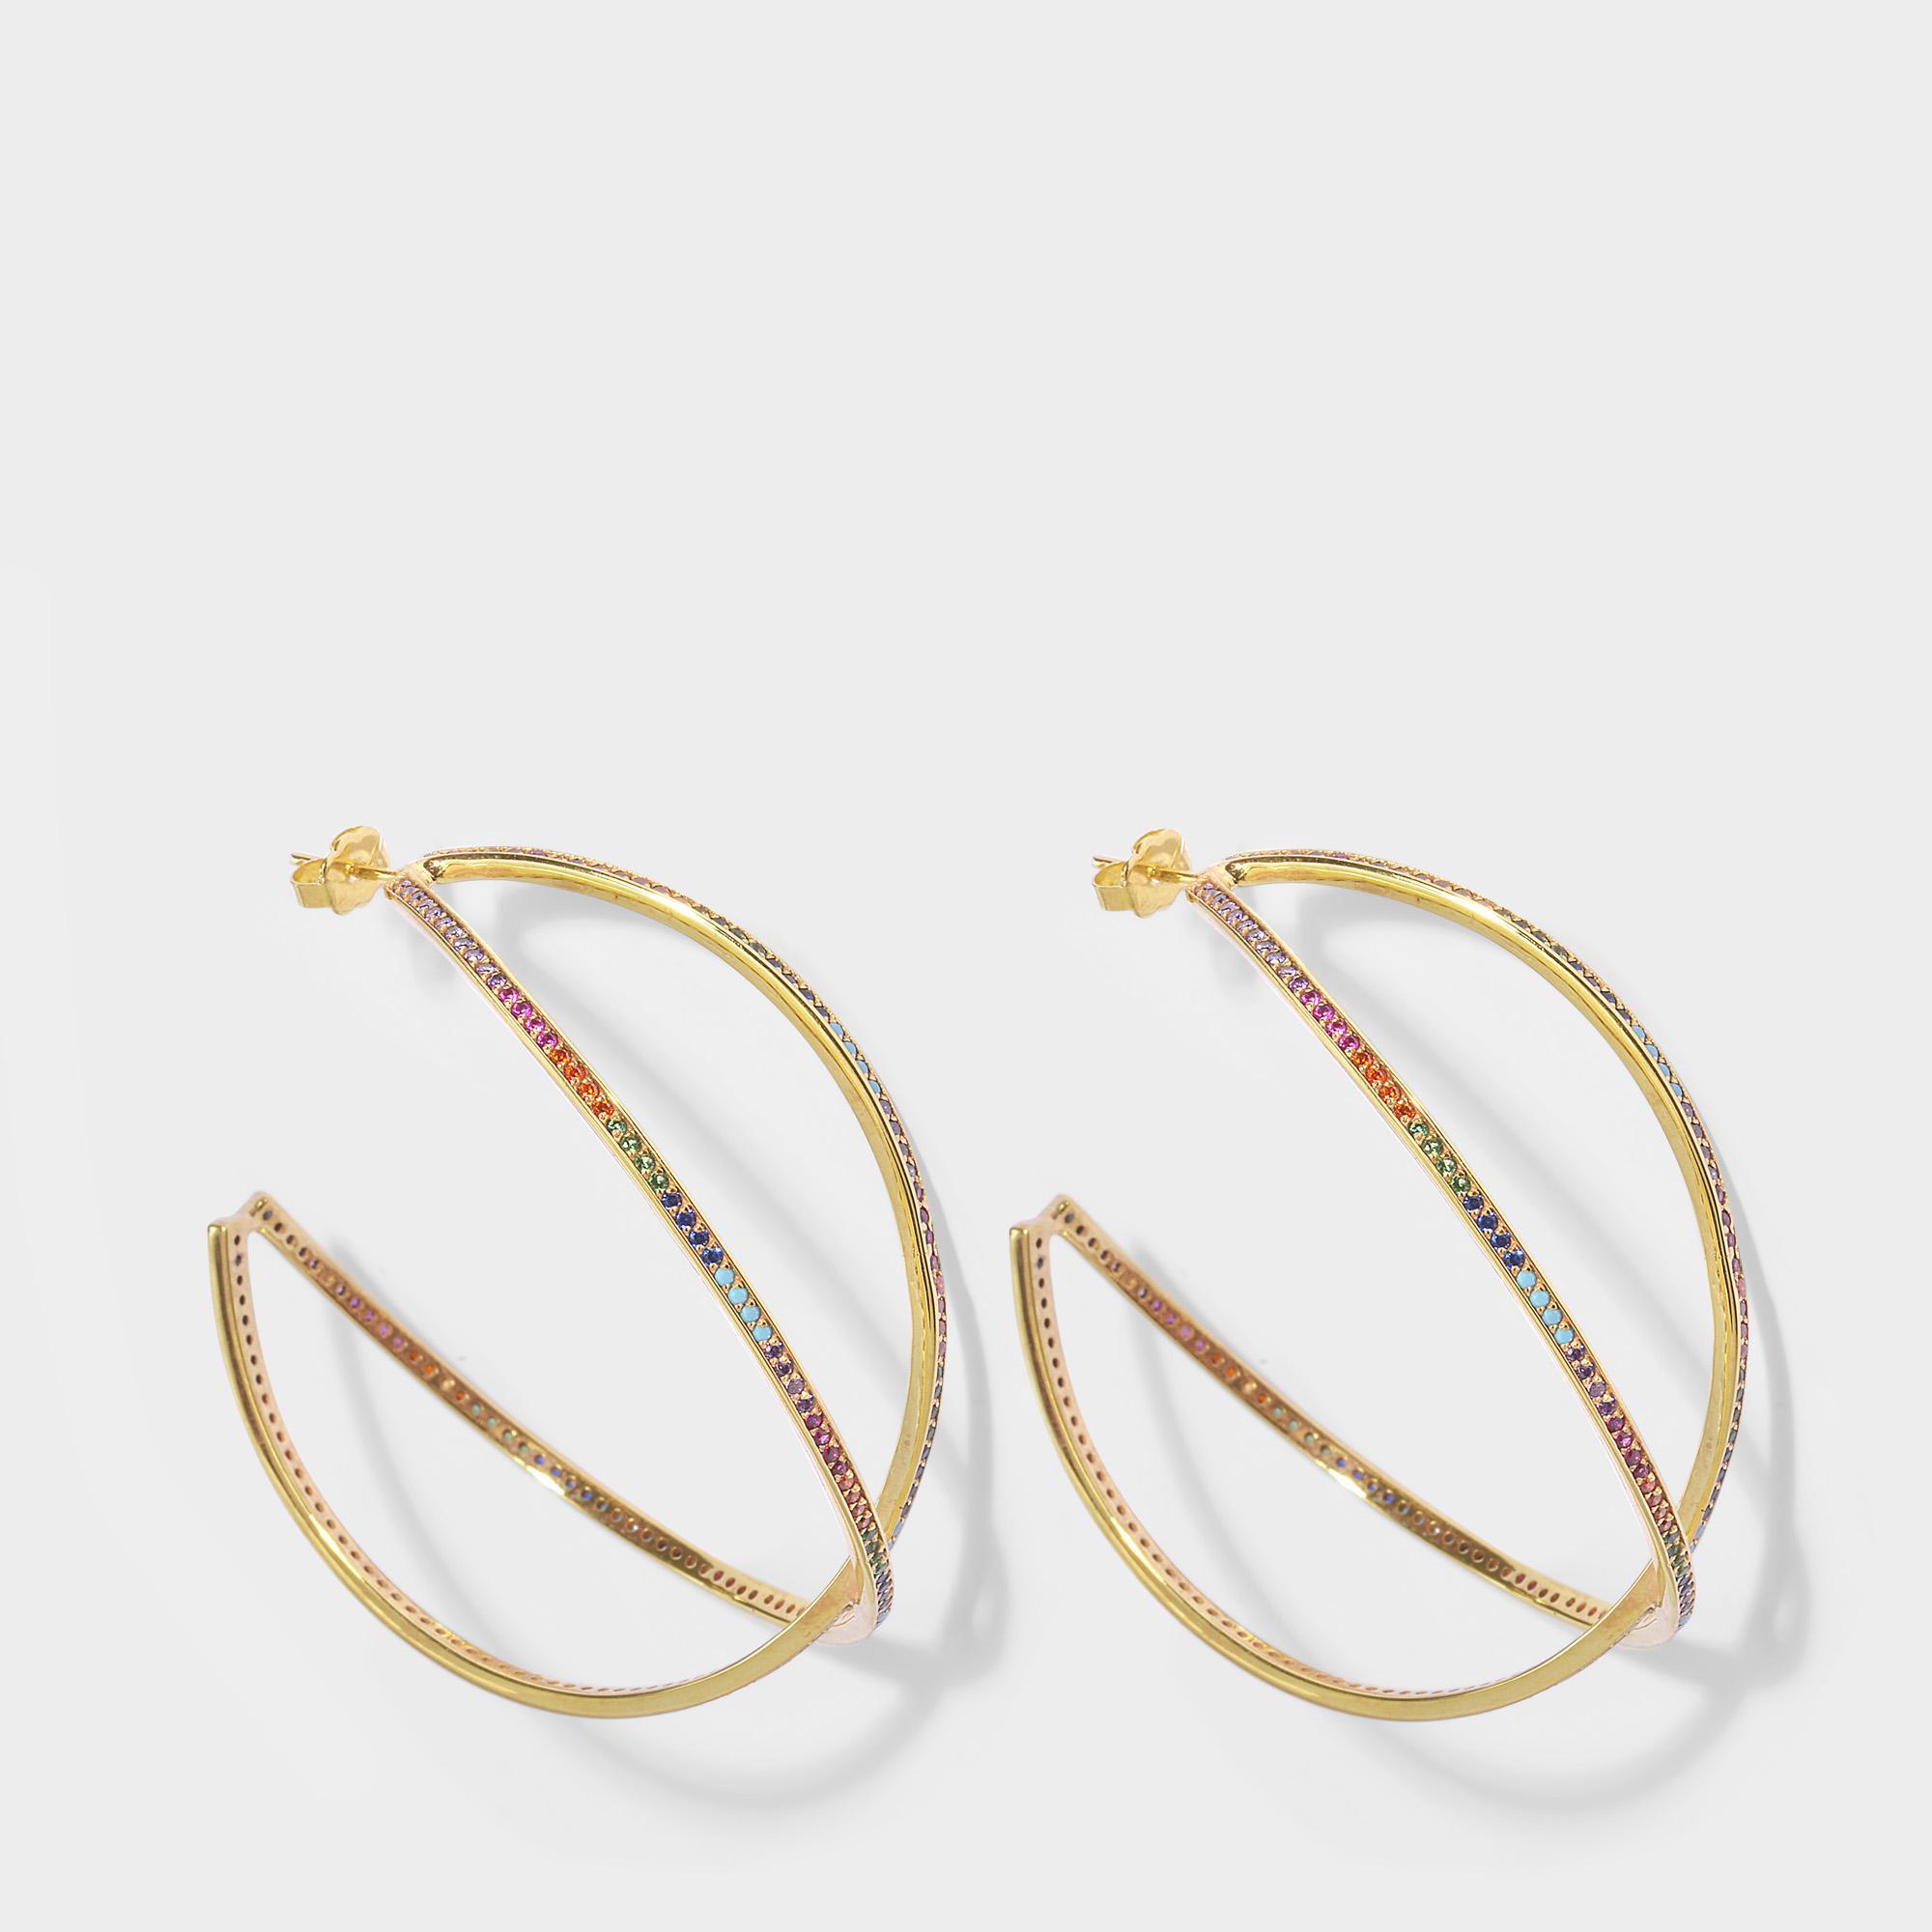 Joanna Laura Constantine Women S Metallic Set Of Two Large Criss Cross Rainbow Hoop Earrings